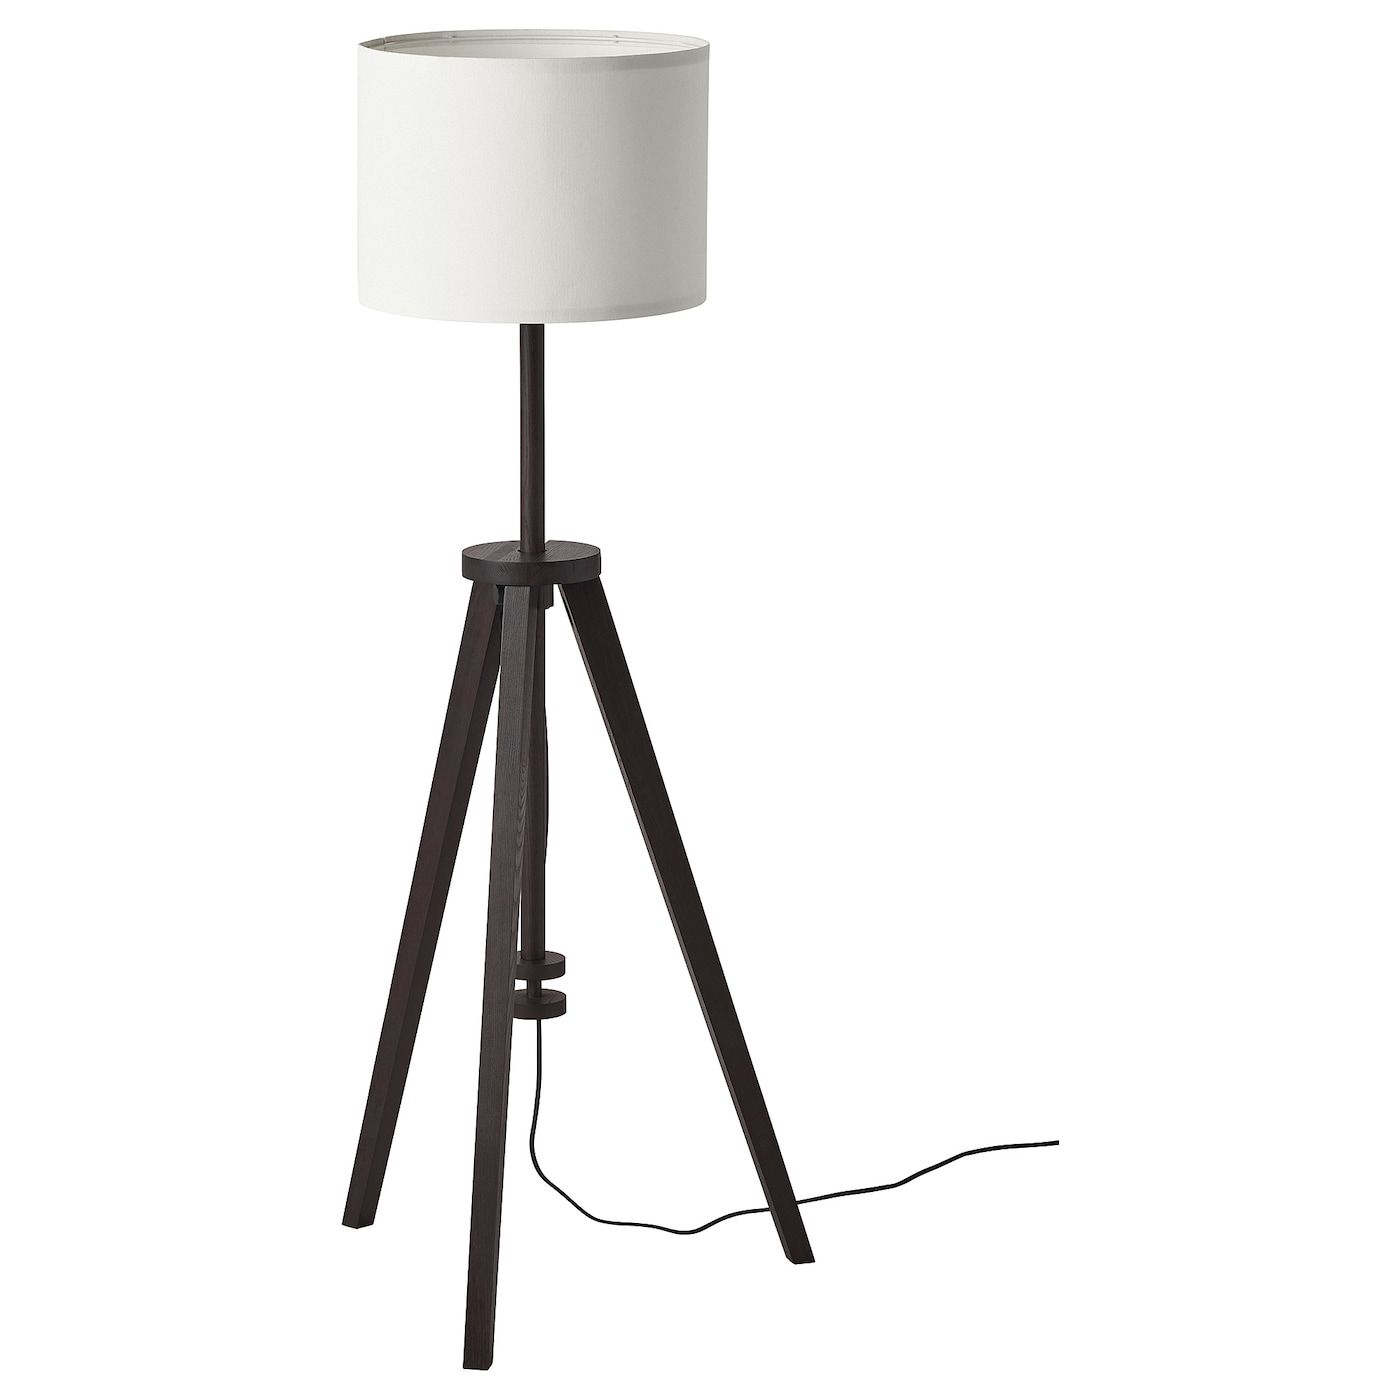 LAUTERS brown ash, white, Table lamp IKEA